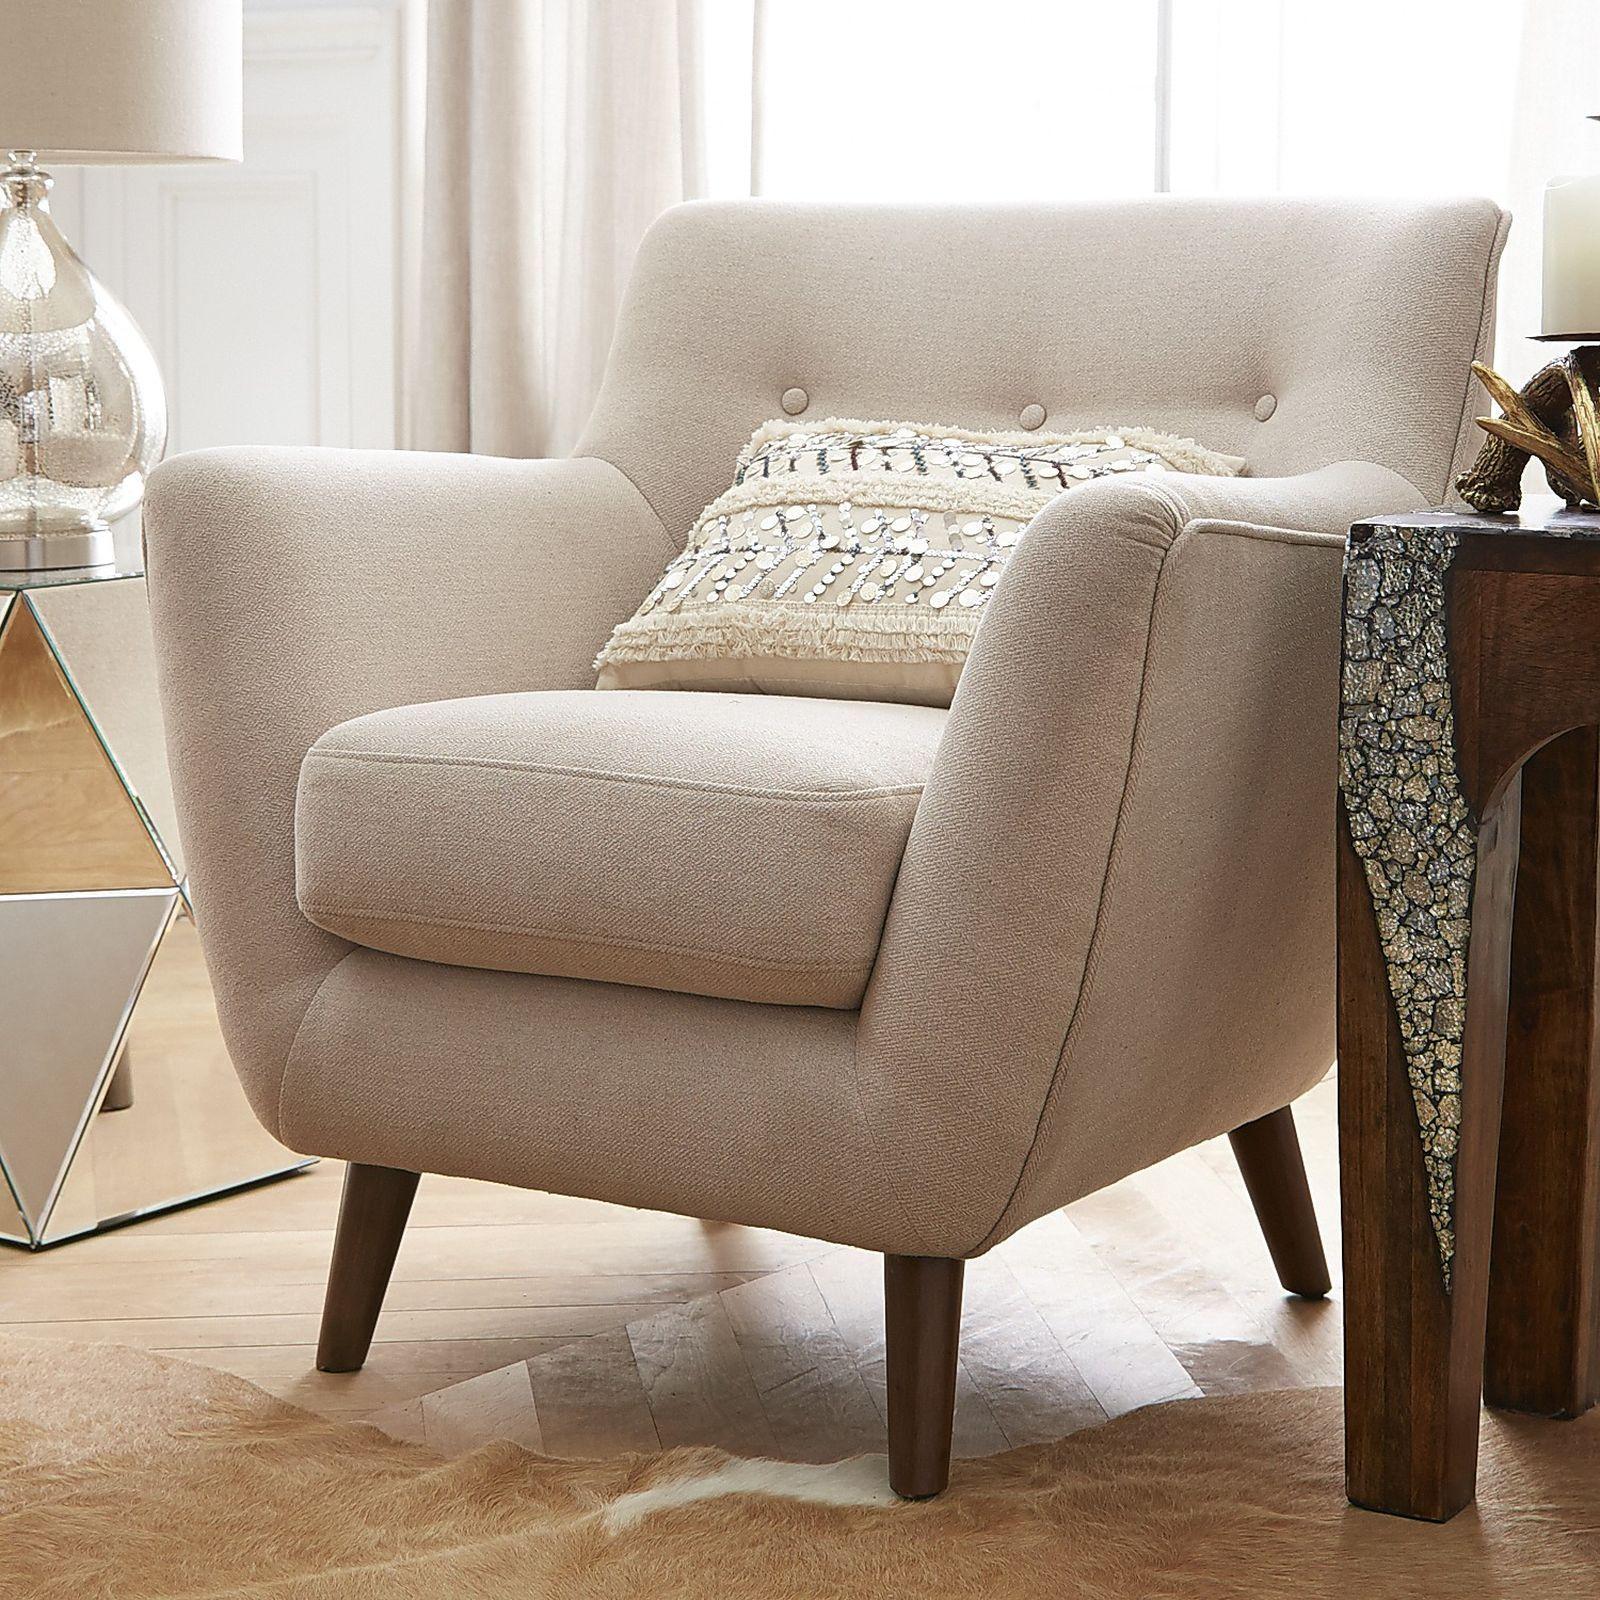 Mitzi Chair - Stone  Quality living room furniture, Furniture